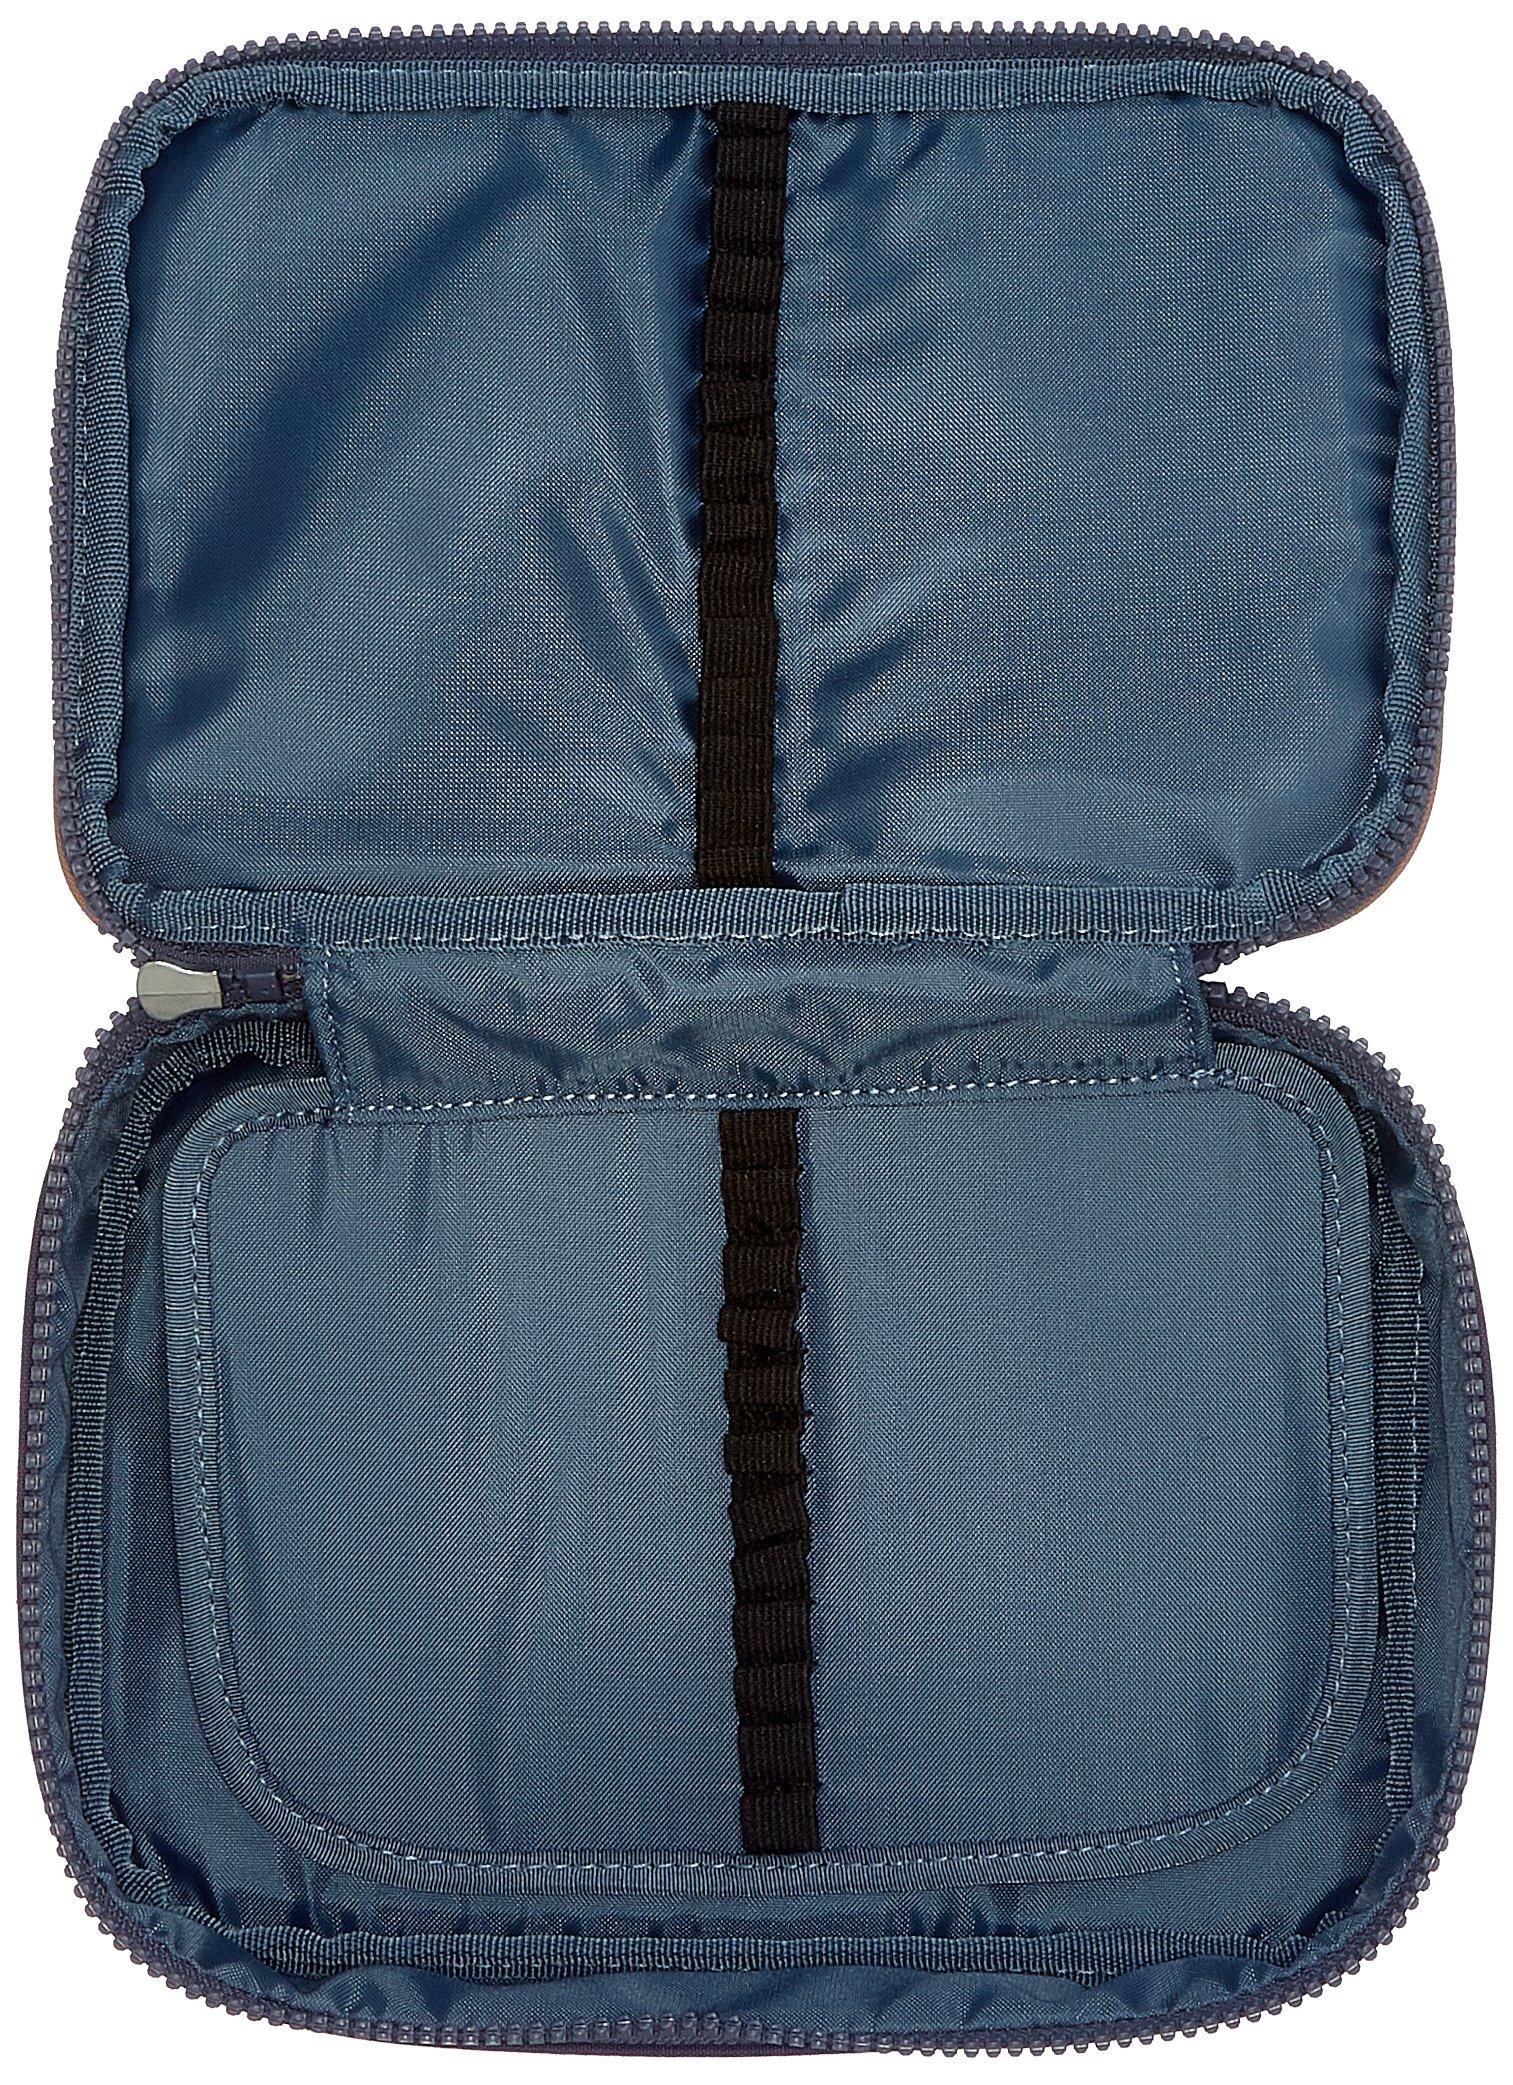 Kipling 100 Pens Estuche Grande, Azul (Blue Tan Block)